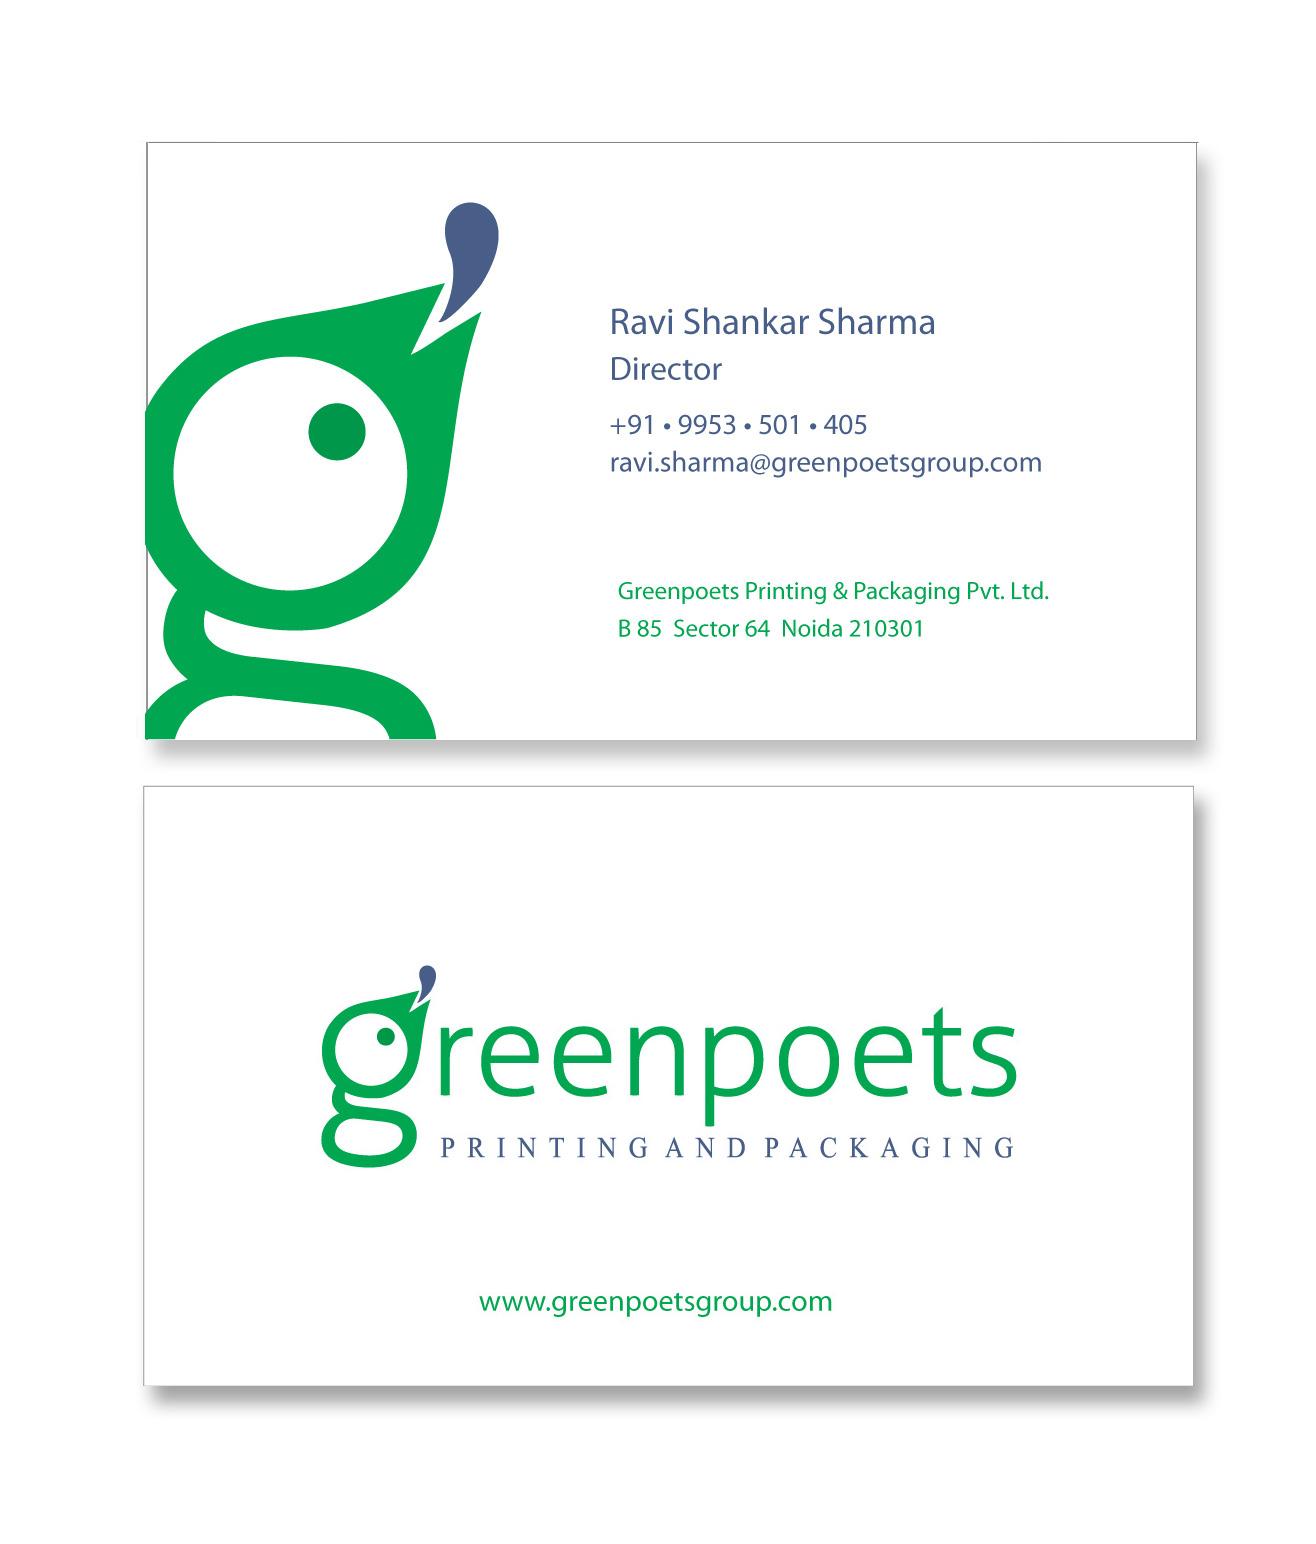 greenpoets-013